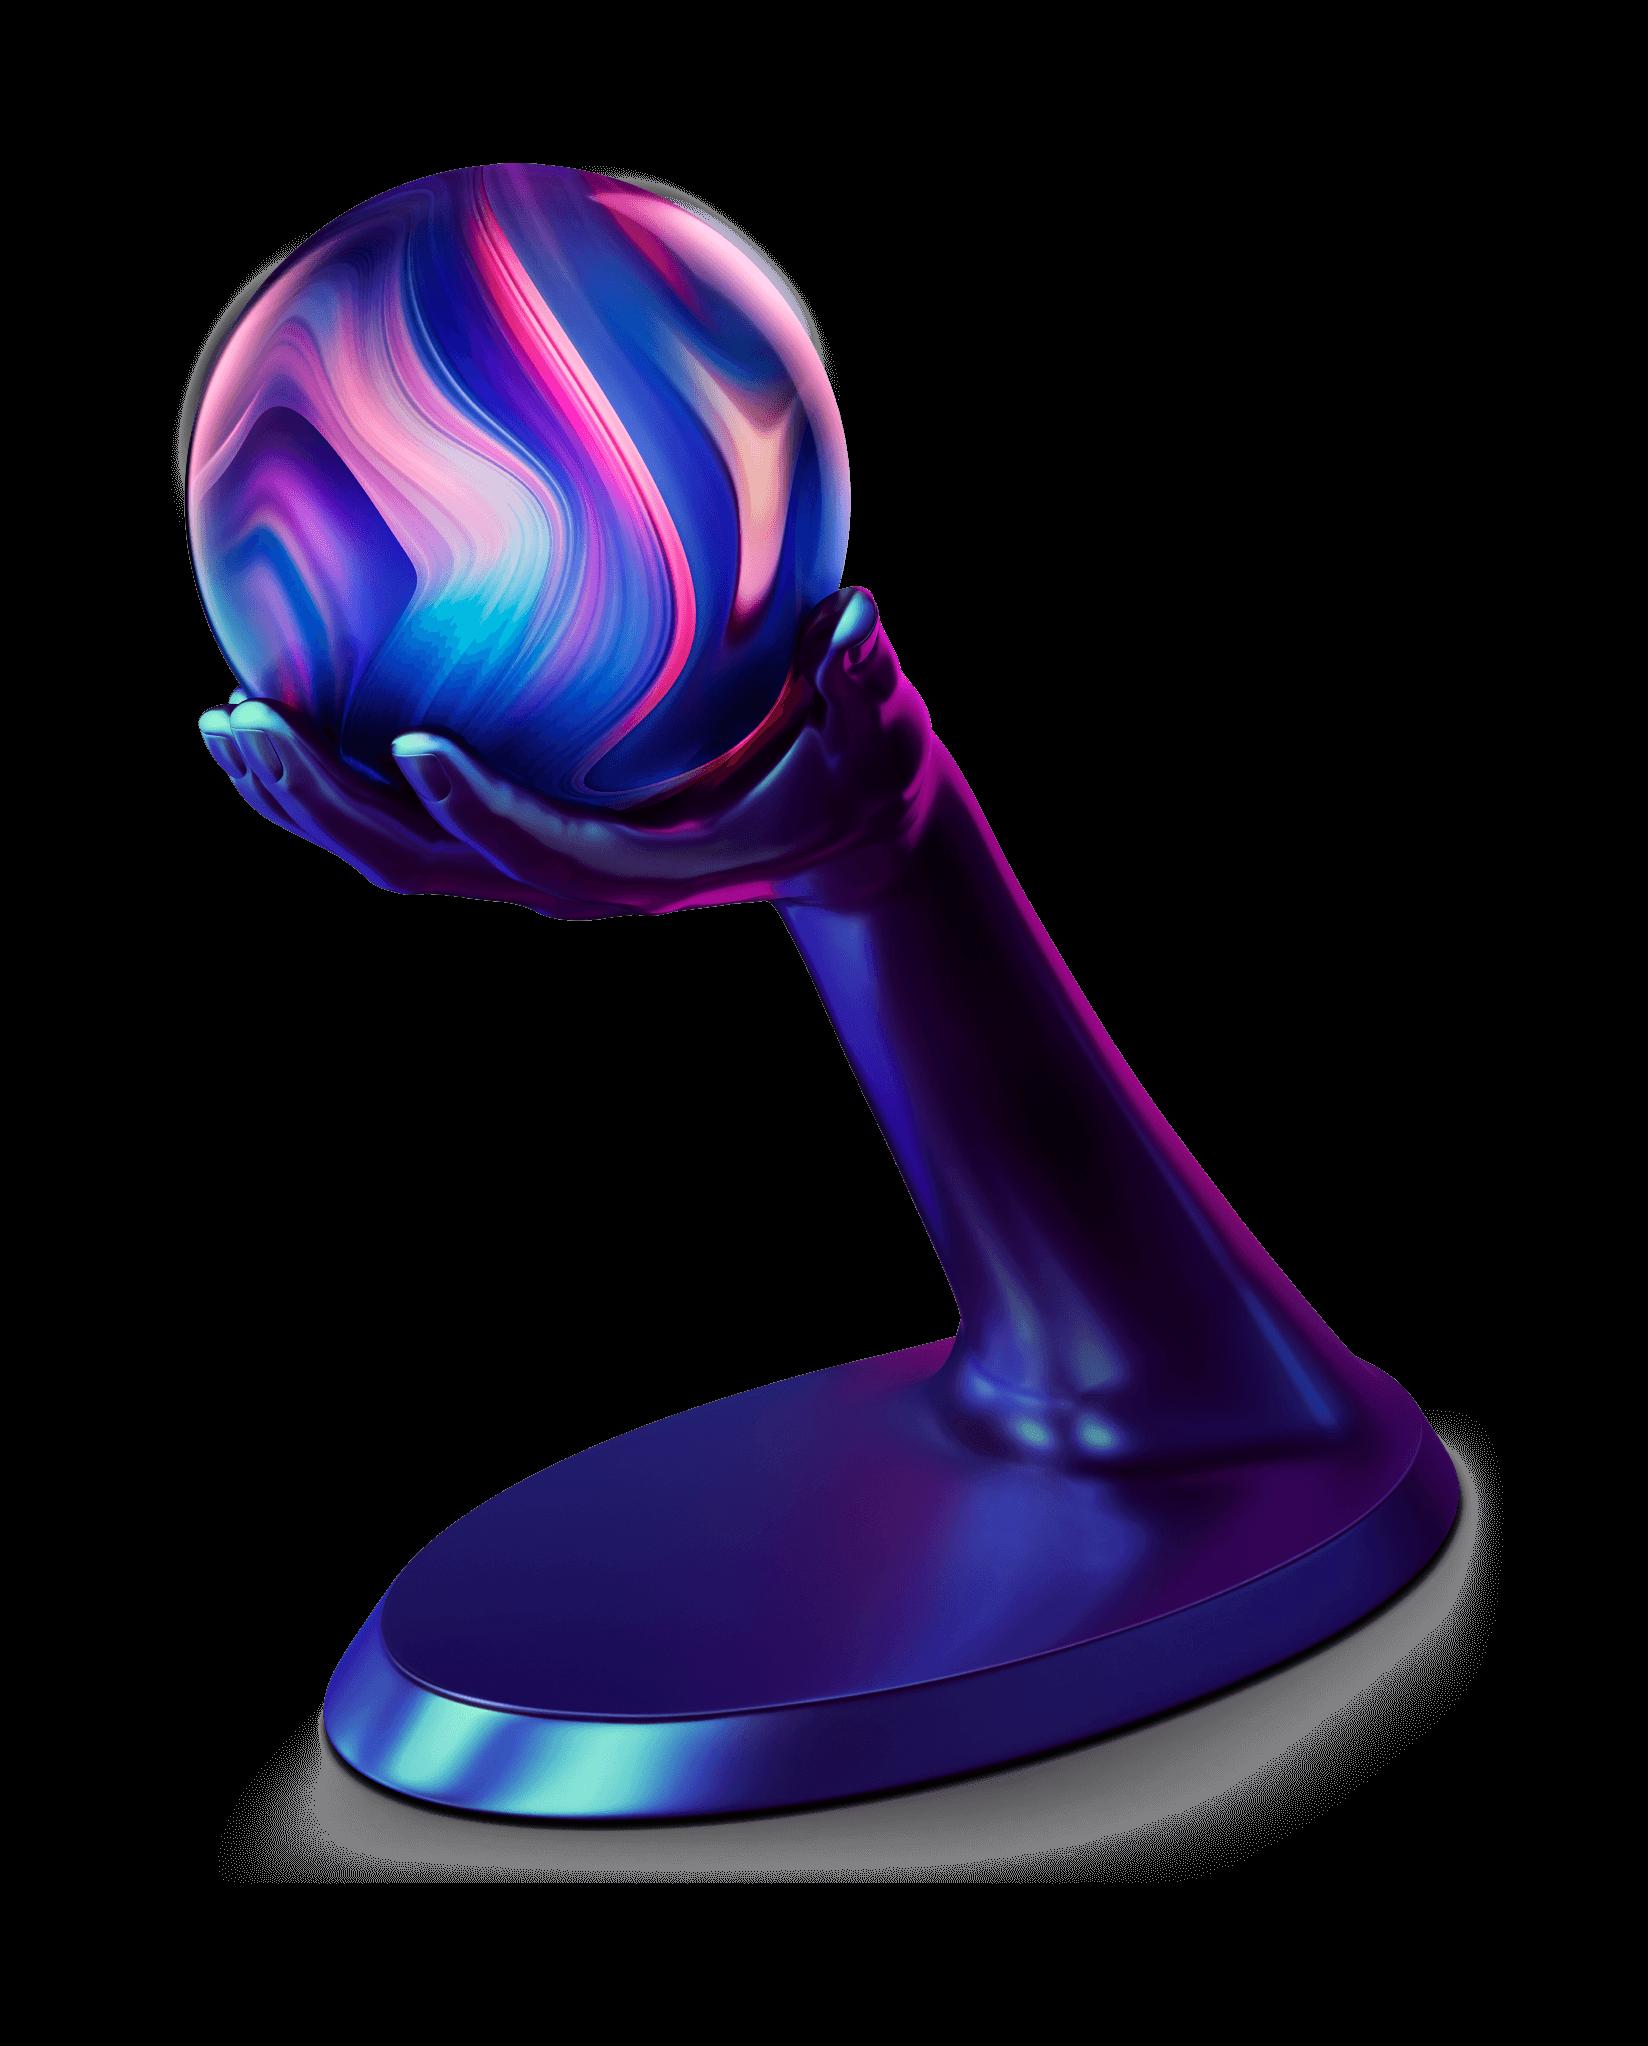 The Omnis Trophy